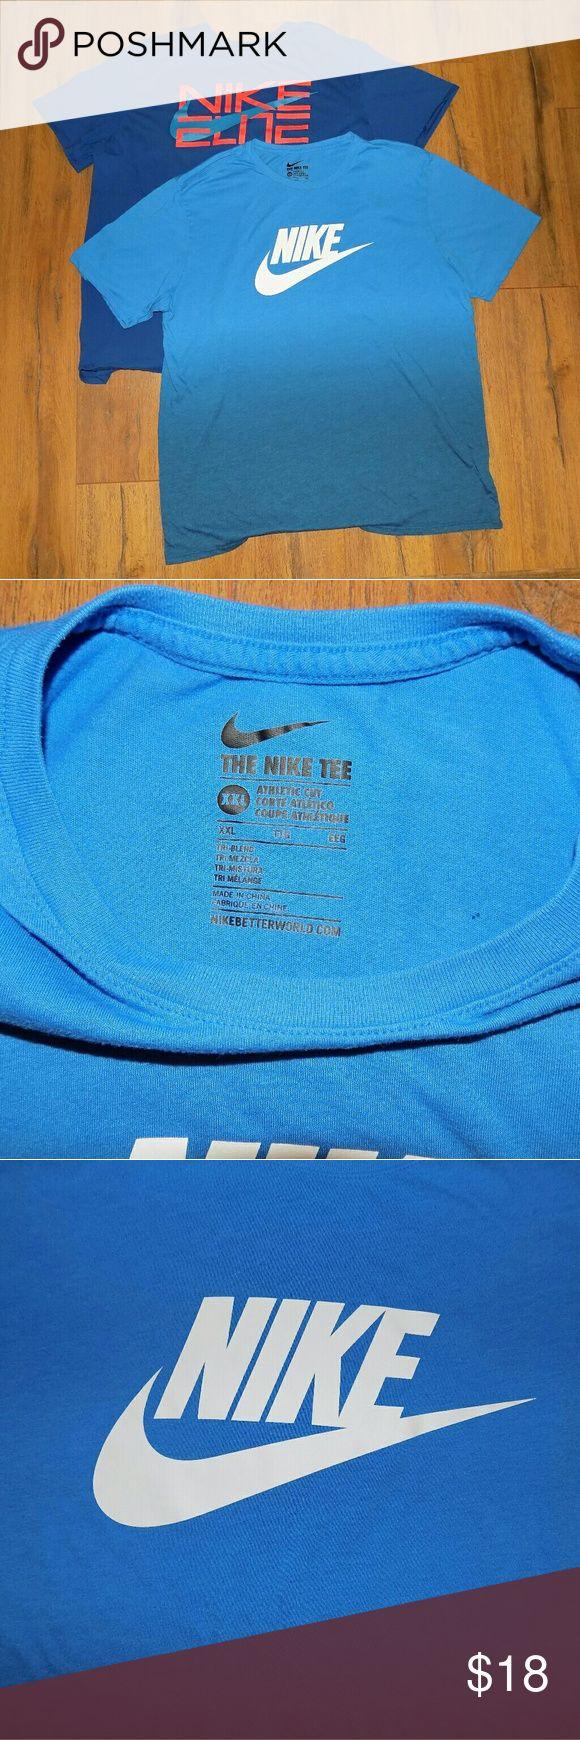 Nike T Shirt Bundle.  2 Tees.  XXL Two XXL Nike T Shirts with silk screen logos.  One dark blue and one gradient blue. Nike Shirts Tees - Short Sleeve